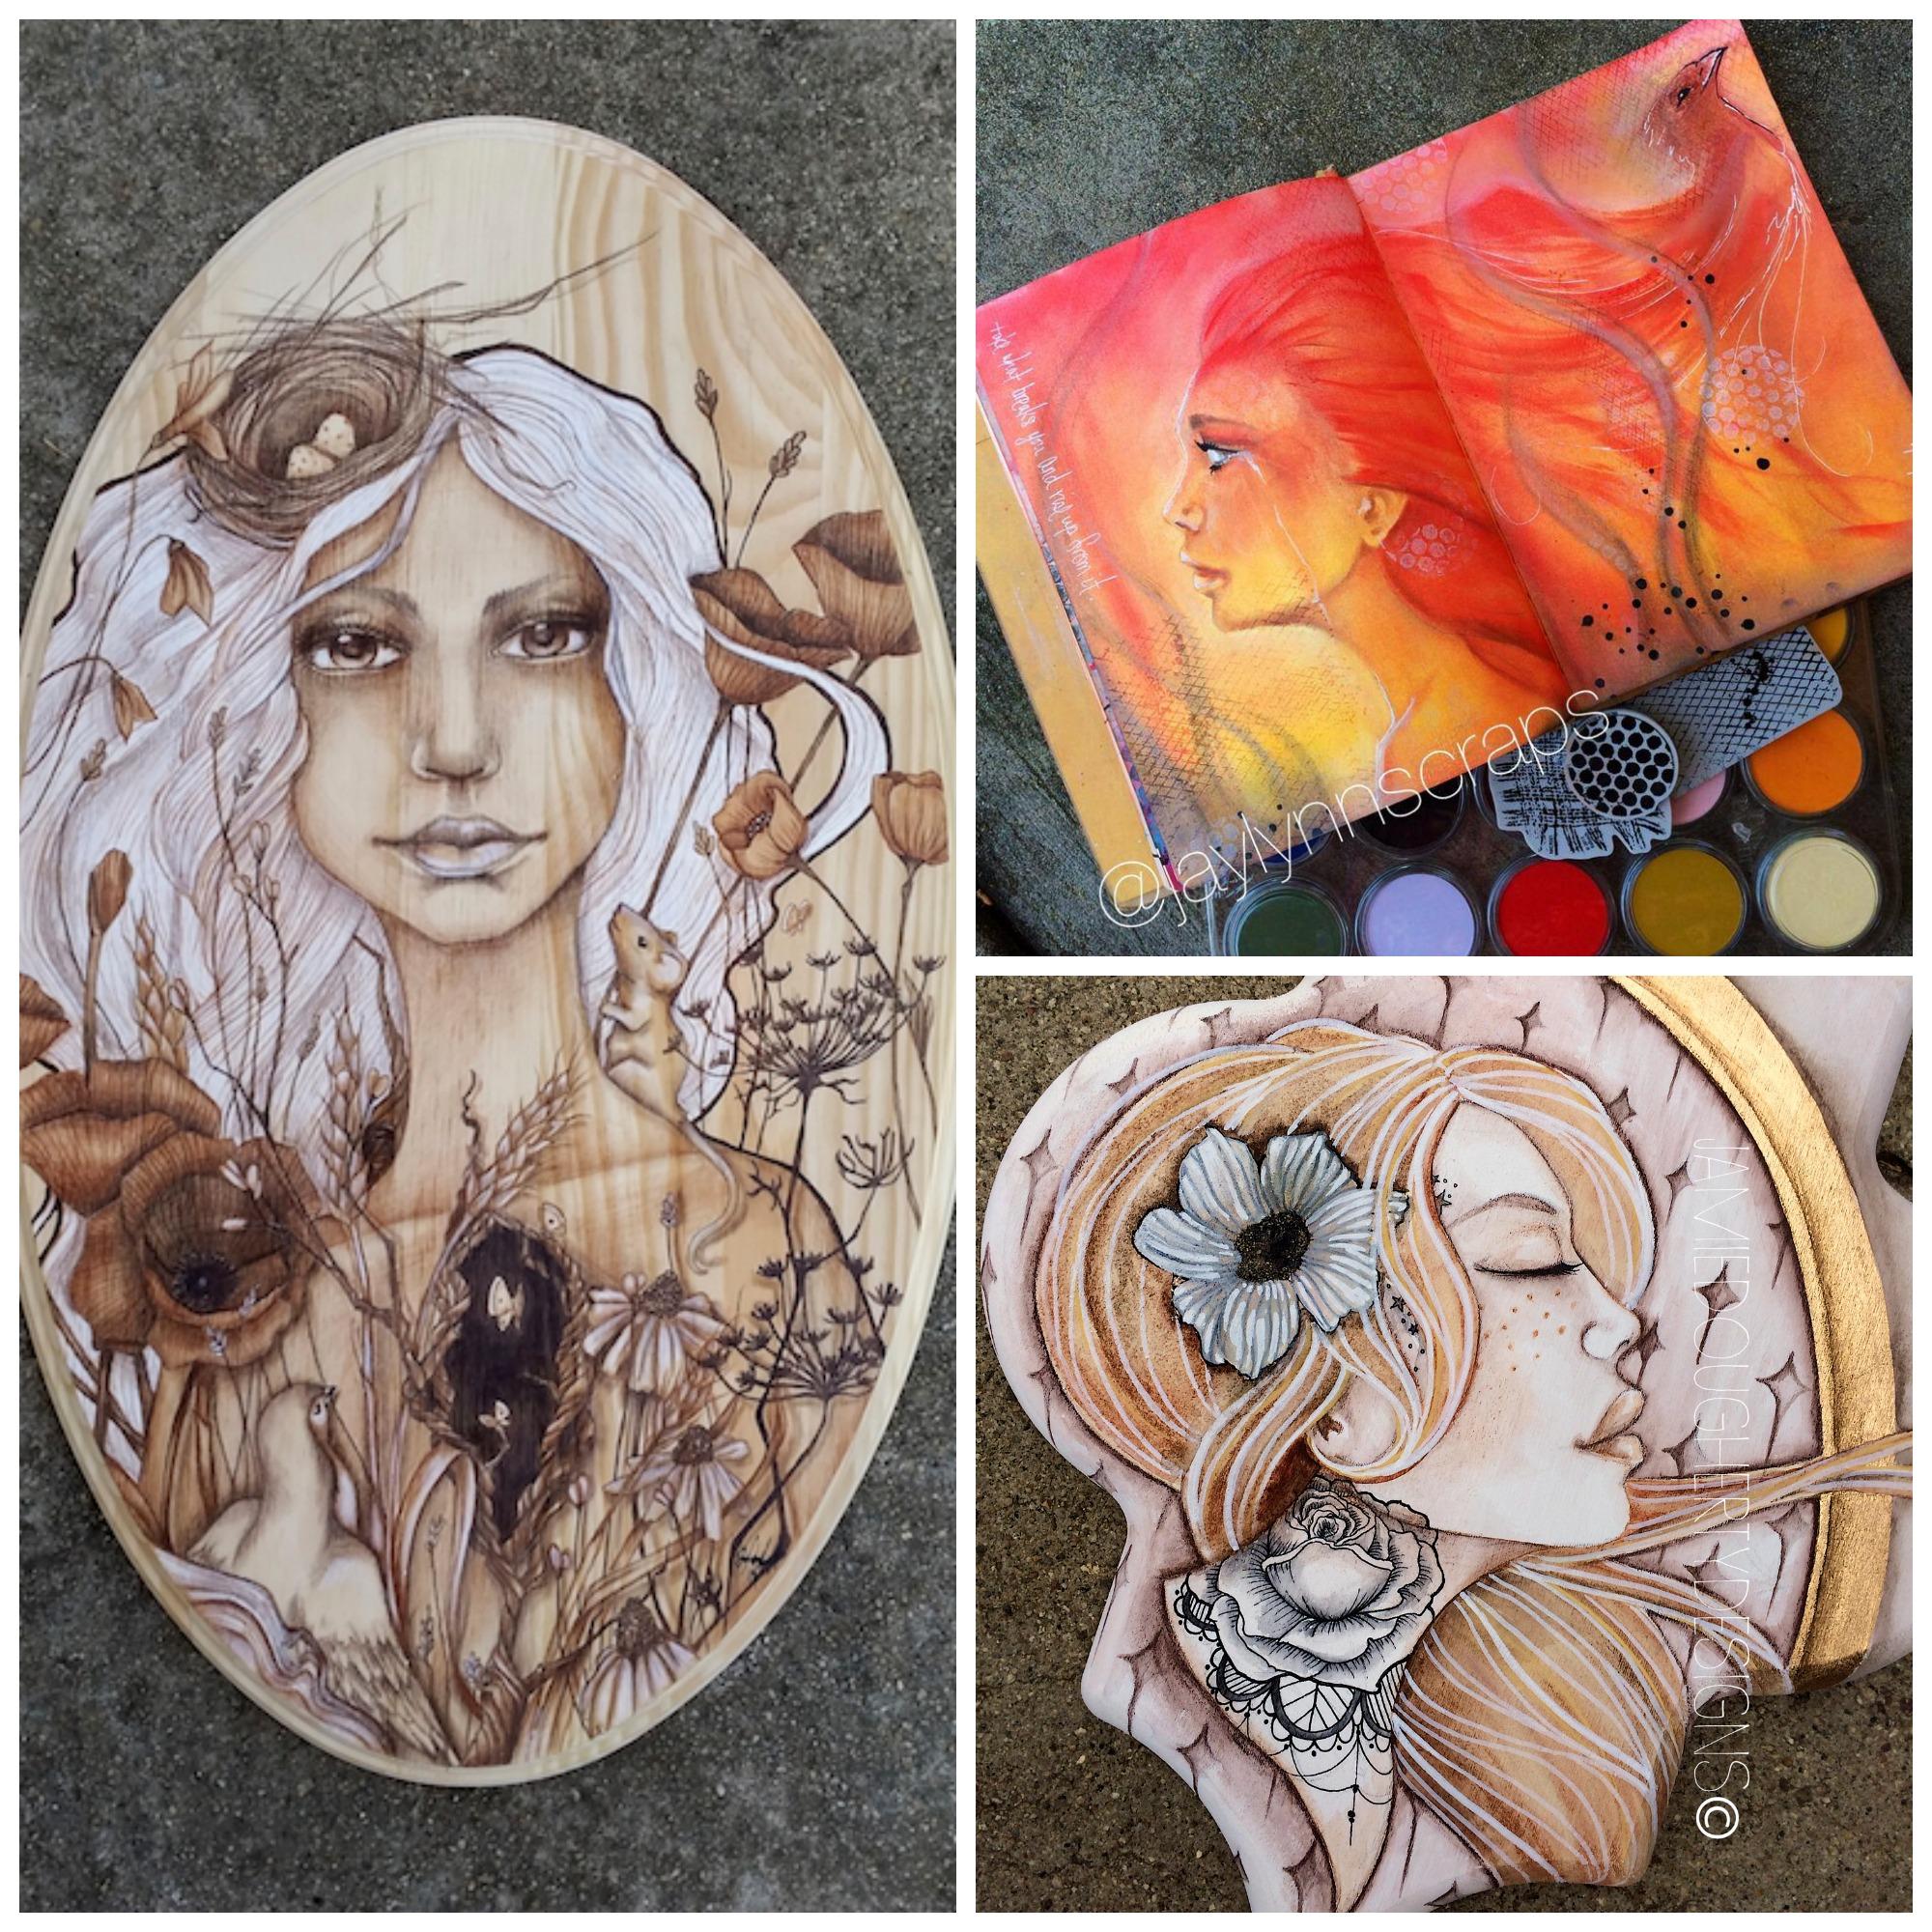 dougherty girls Explore pin up art, girls girls girls, and more fantasy art pin up art girls girls girls.